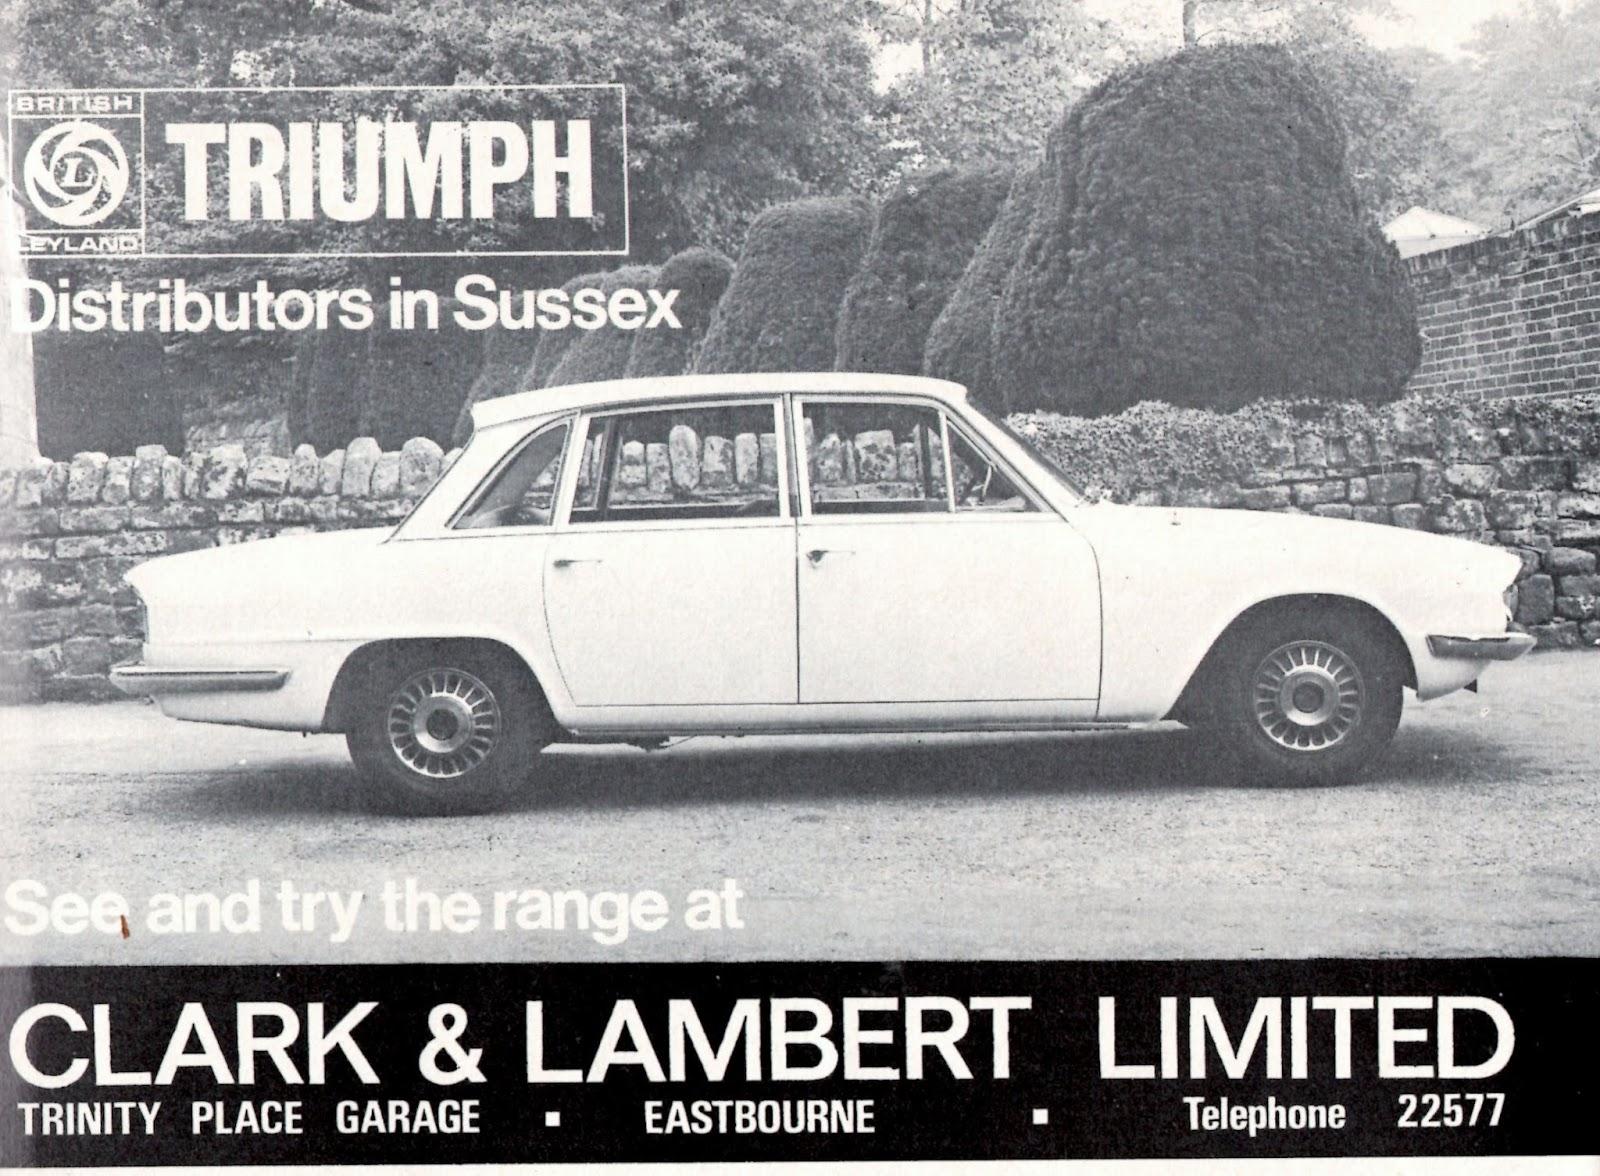 ClarkandLambert1970Advert.jpg